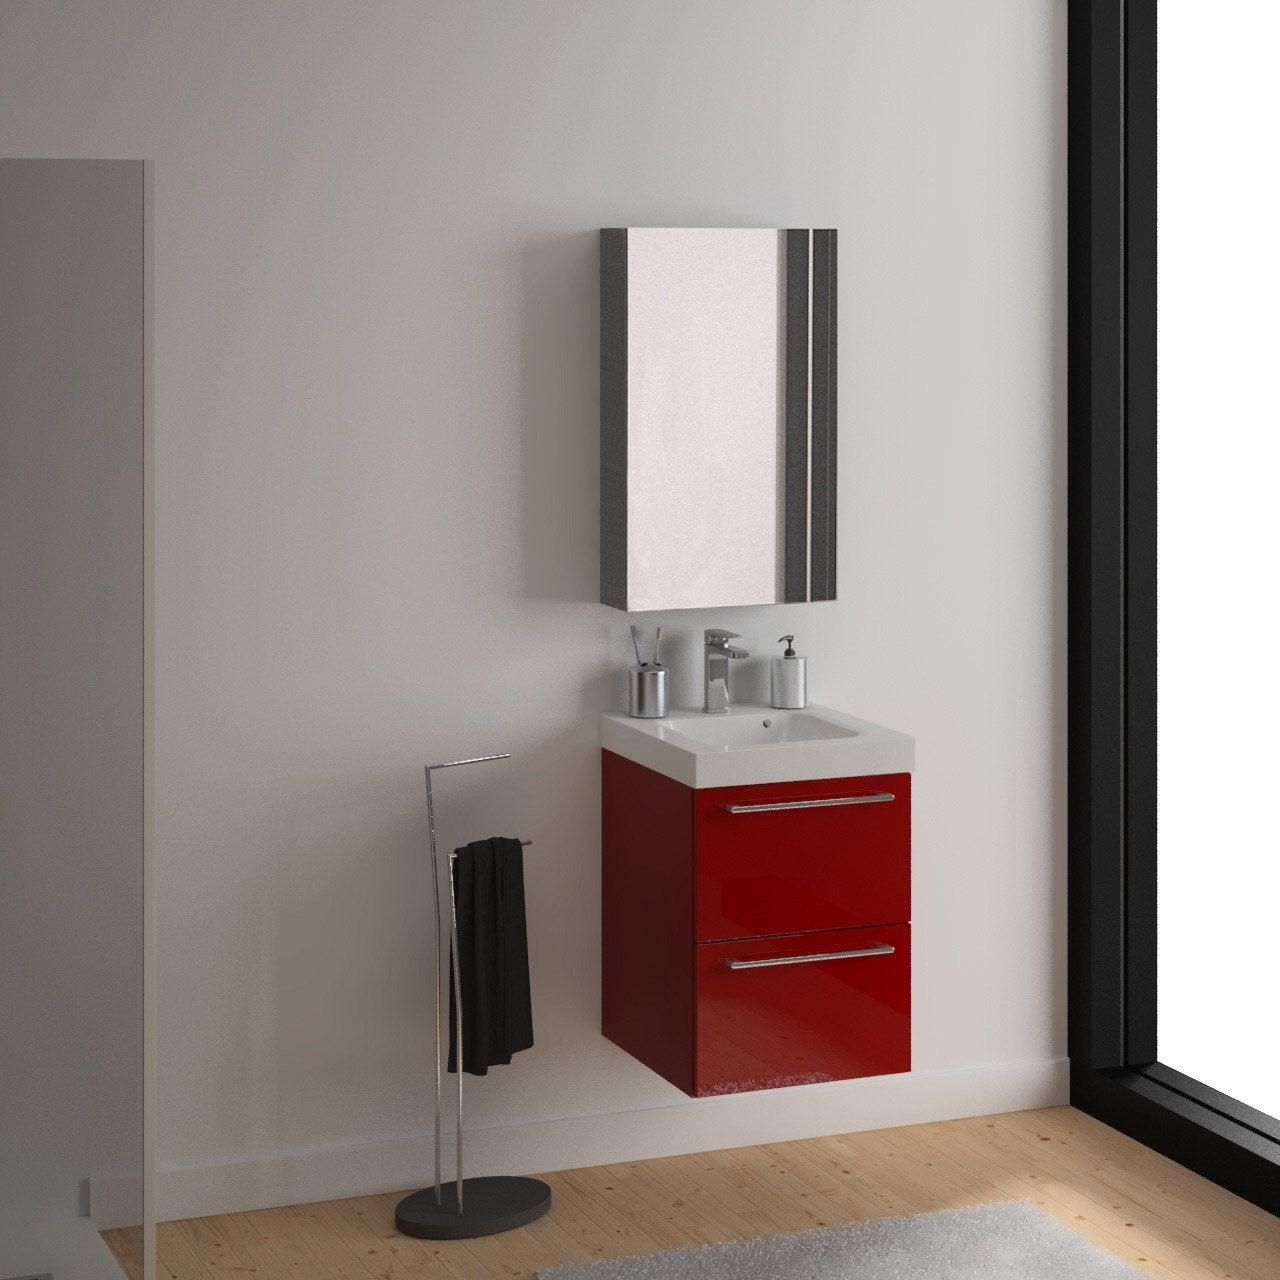 Meuble salle bain rouge - Soldes salle de bain leroy merlin ...